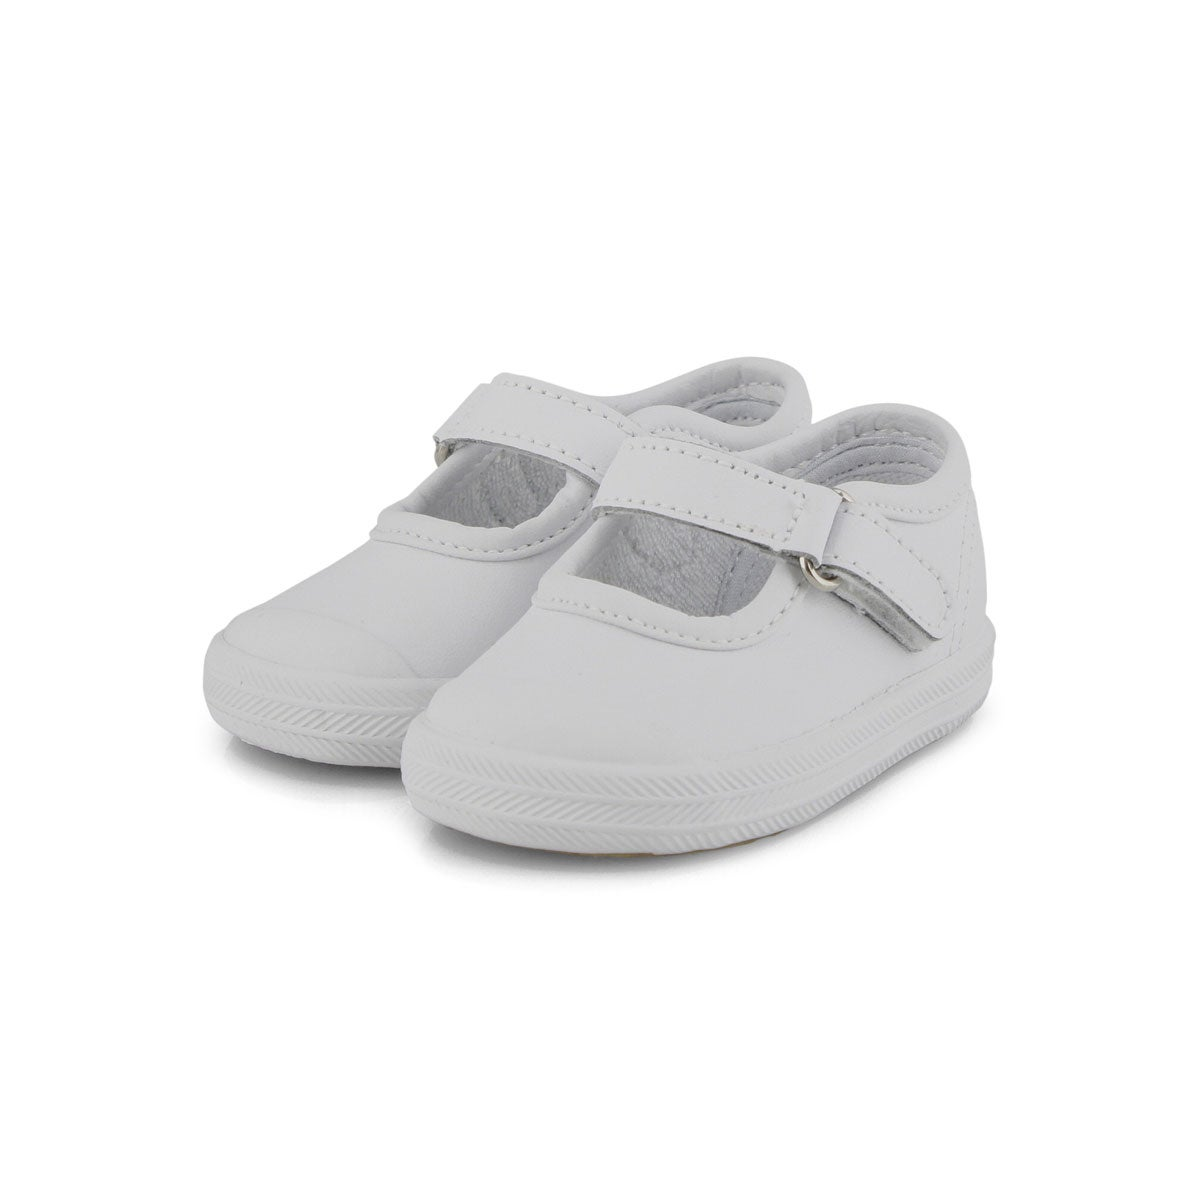 Infants' CHAMPION TOE CAP MJ white Mary Janes